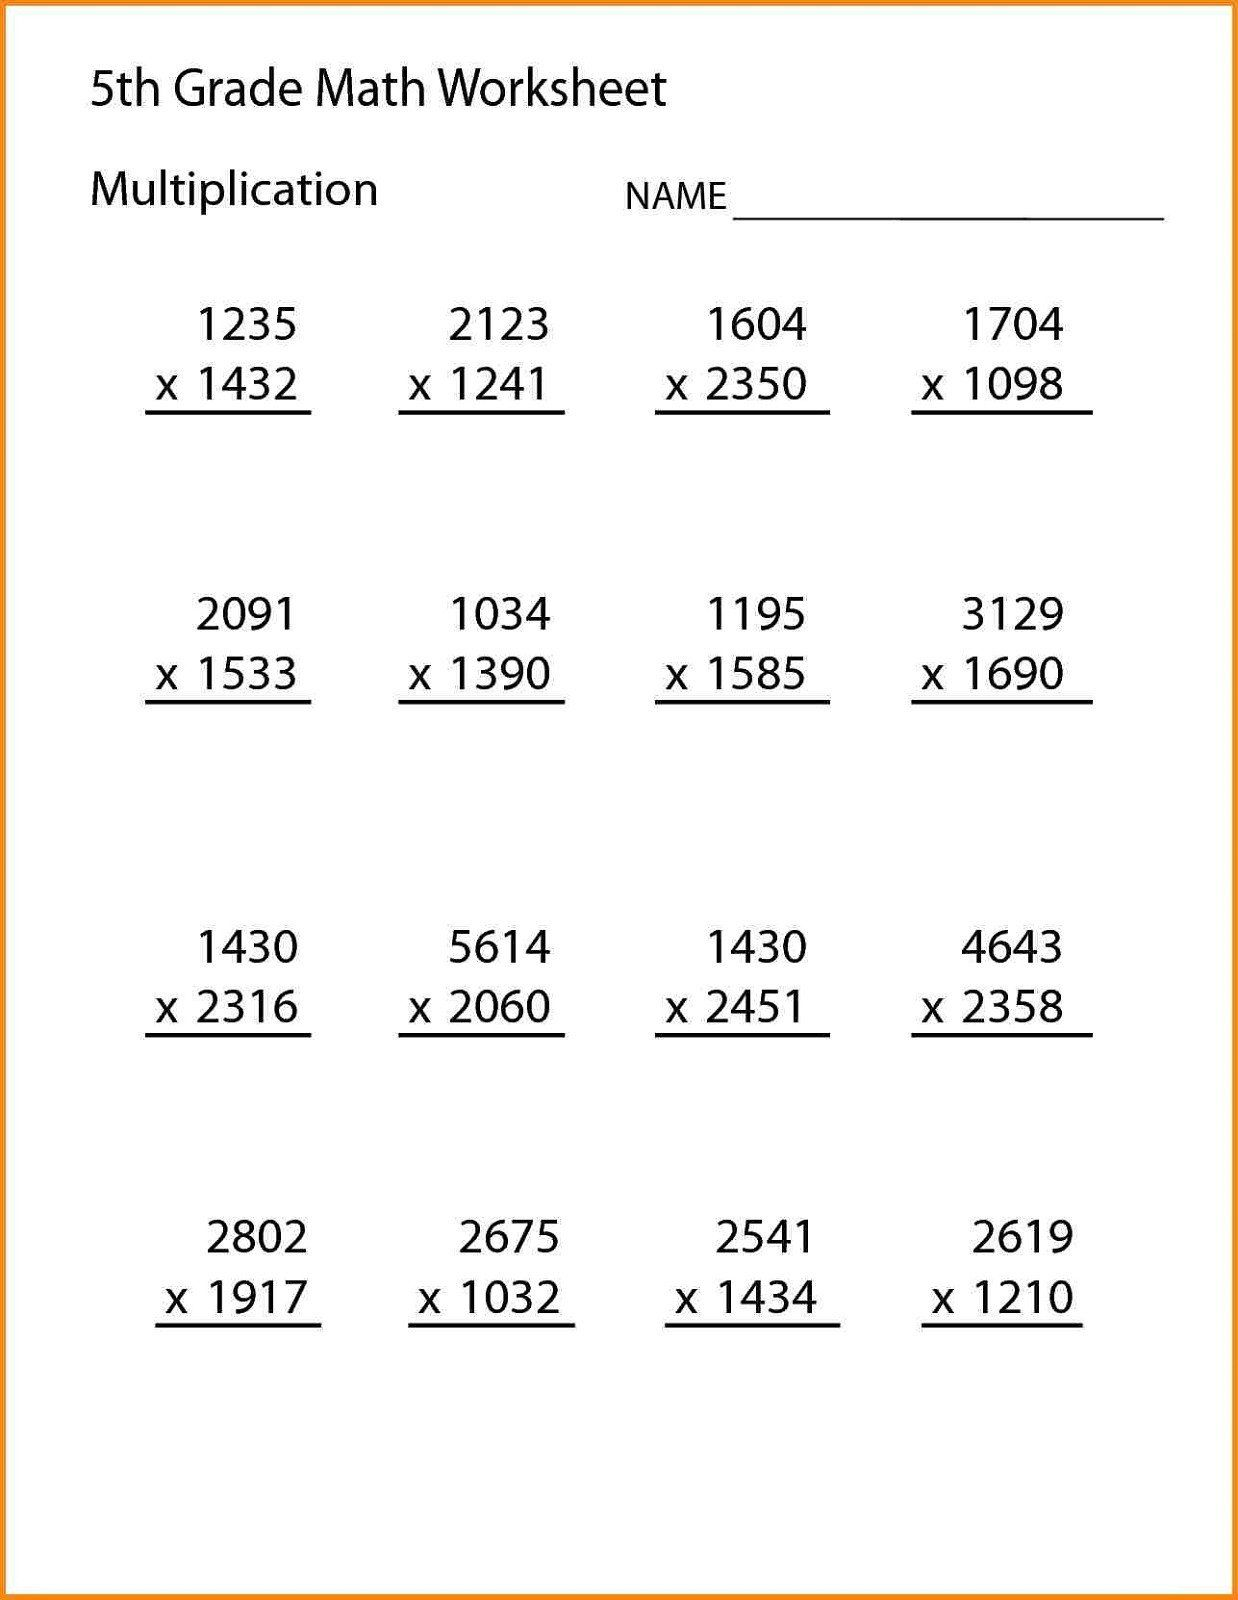 5th Grade Math Worksheet Fifth Grade Math Worksheets In